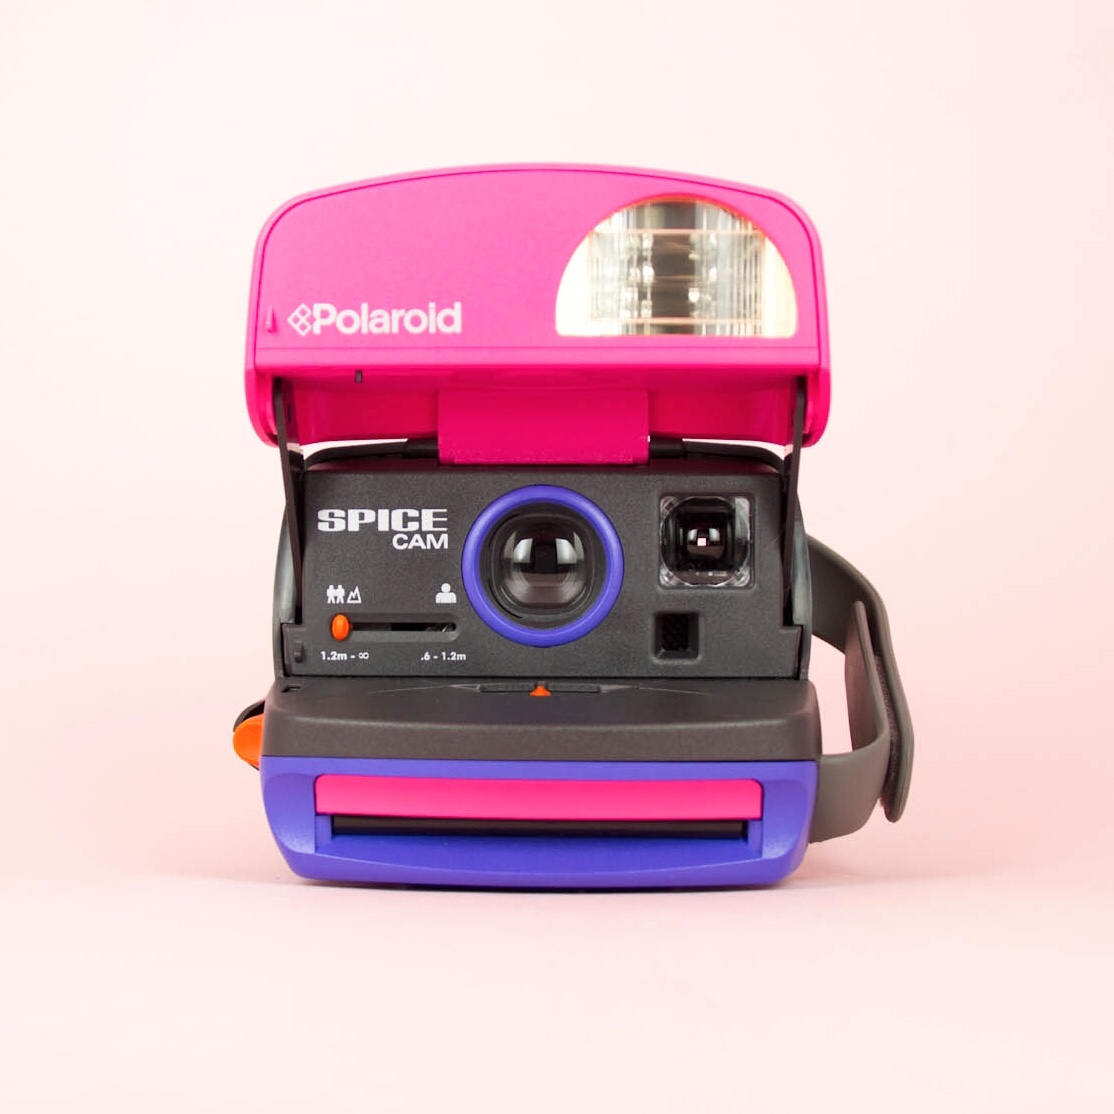 Polaroid Spice Cam